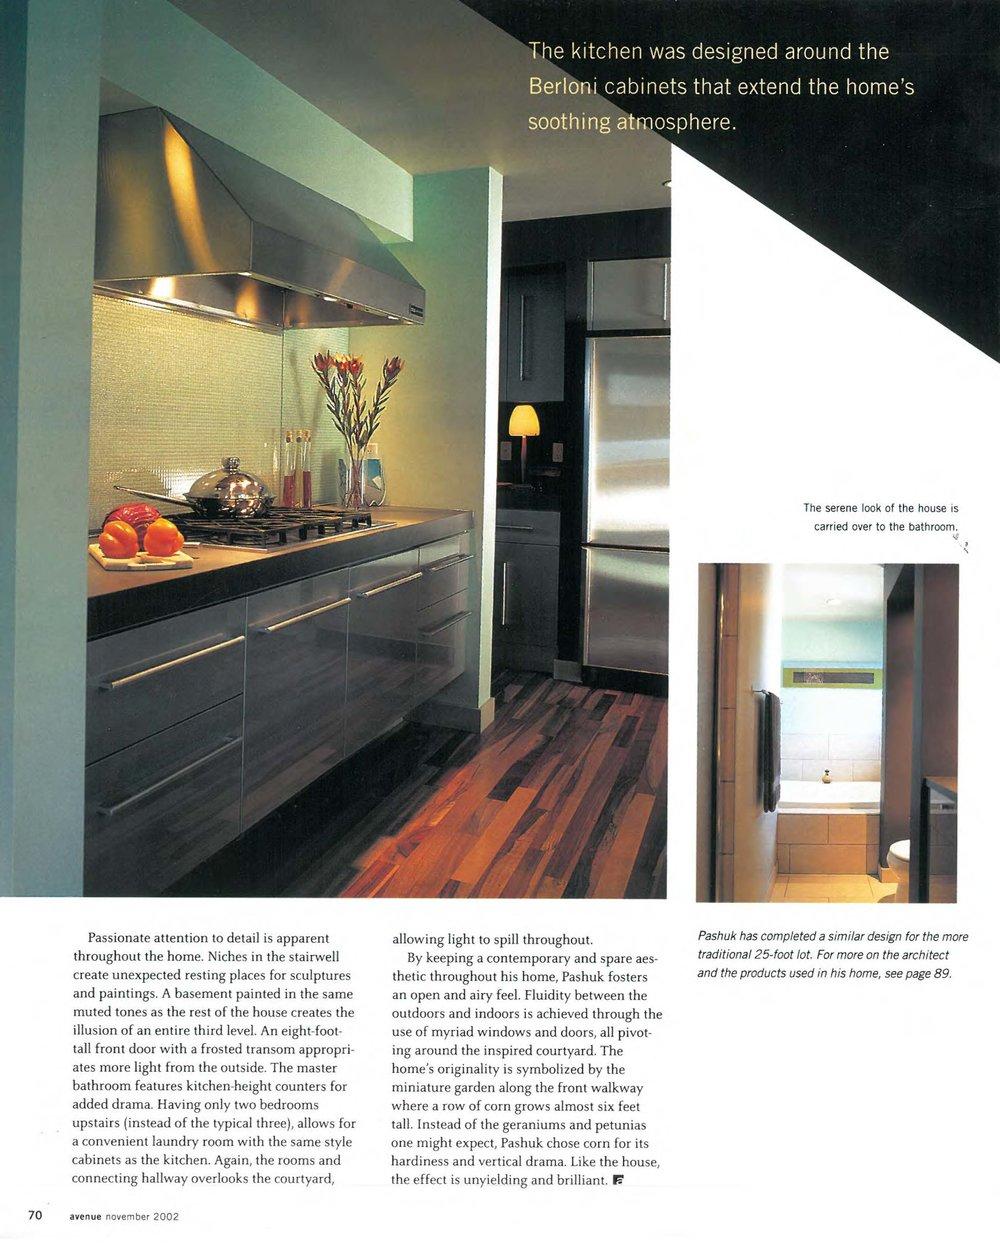 AvenueMagazine_November2002-3.jpg